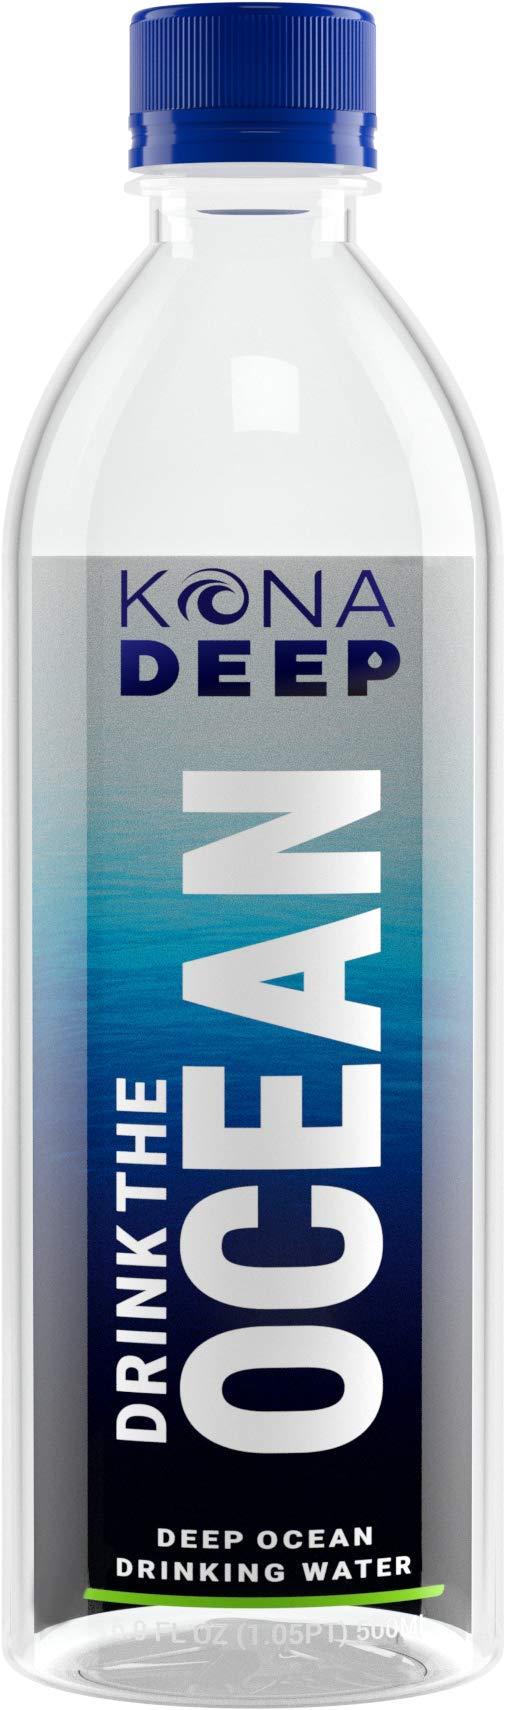 Kona Deep Pure Deep Ocean Electrolyte Mineral Water Bottles (500 ML), 24 Count by Kona Deep